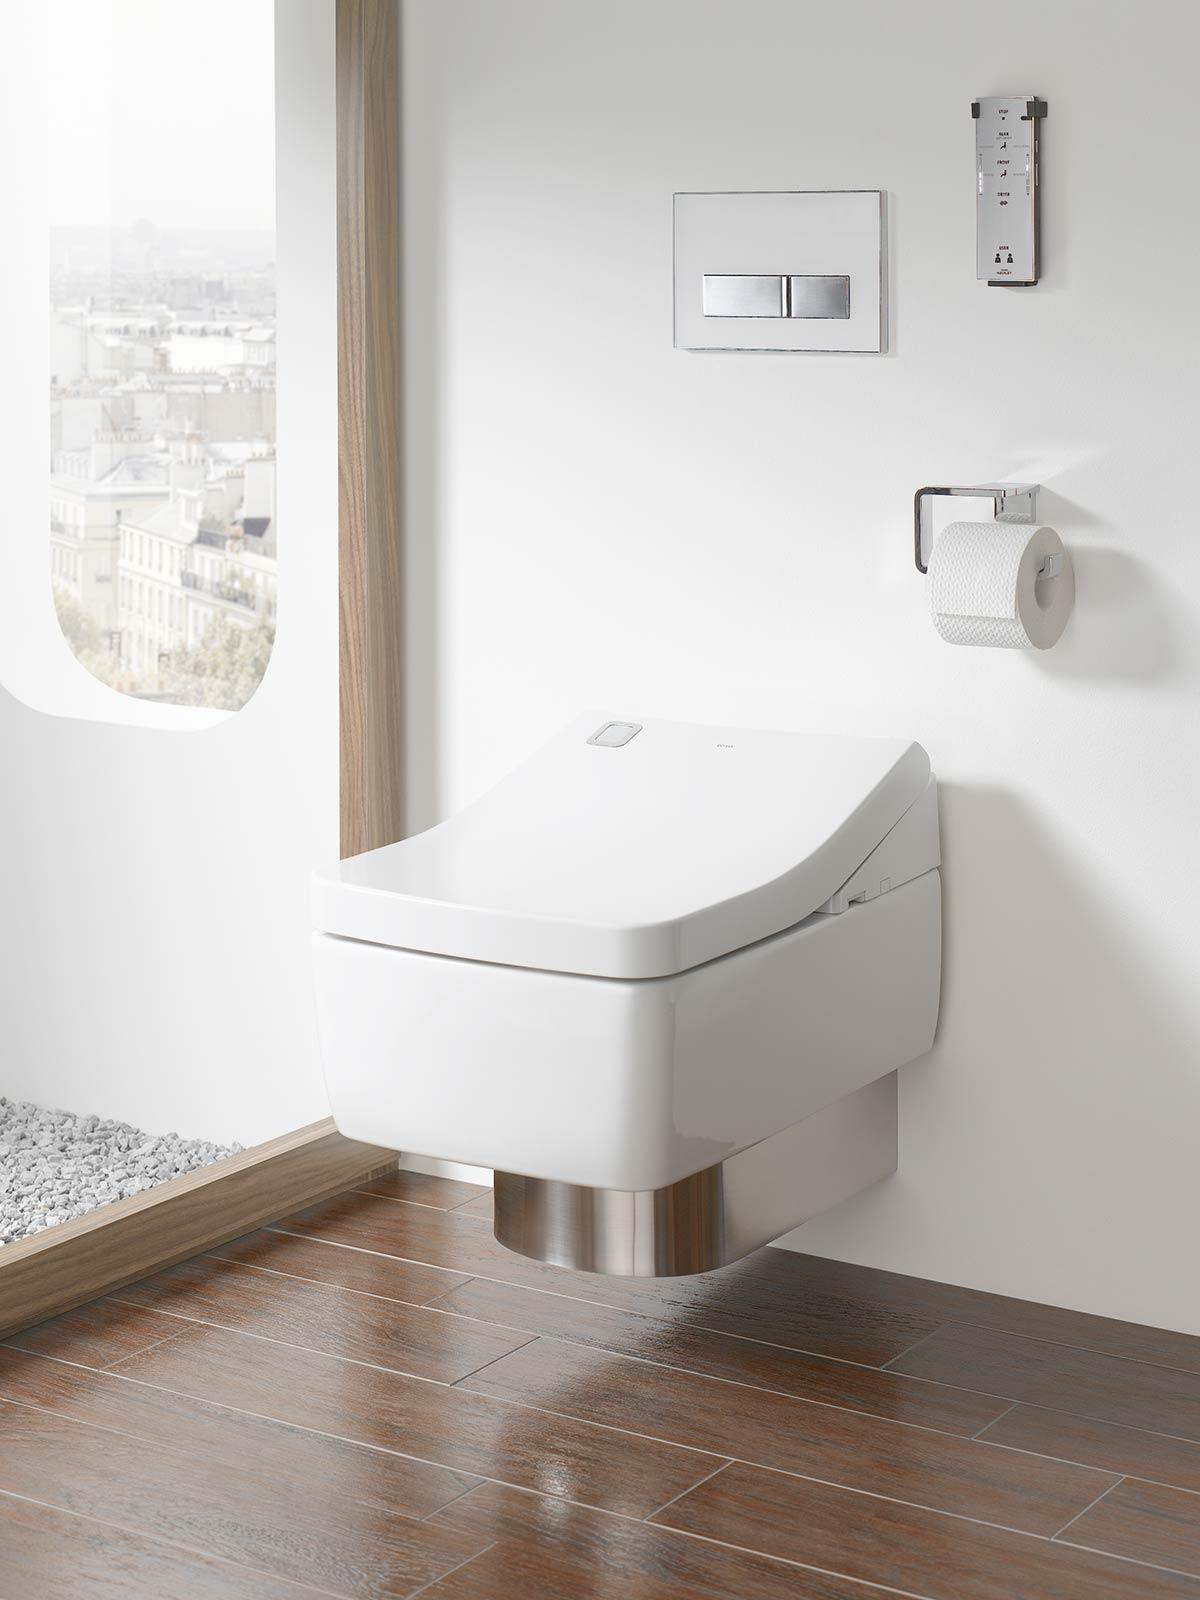 toto-miljoe-sg-washlet-1-1200×1600